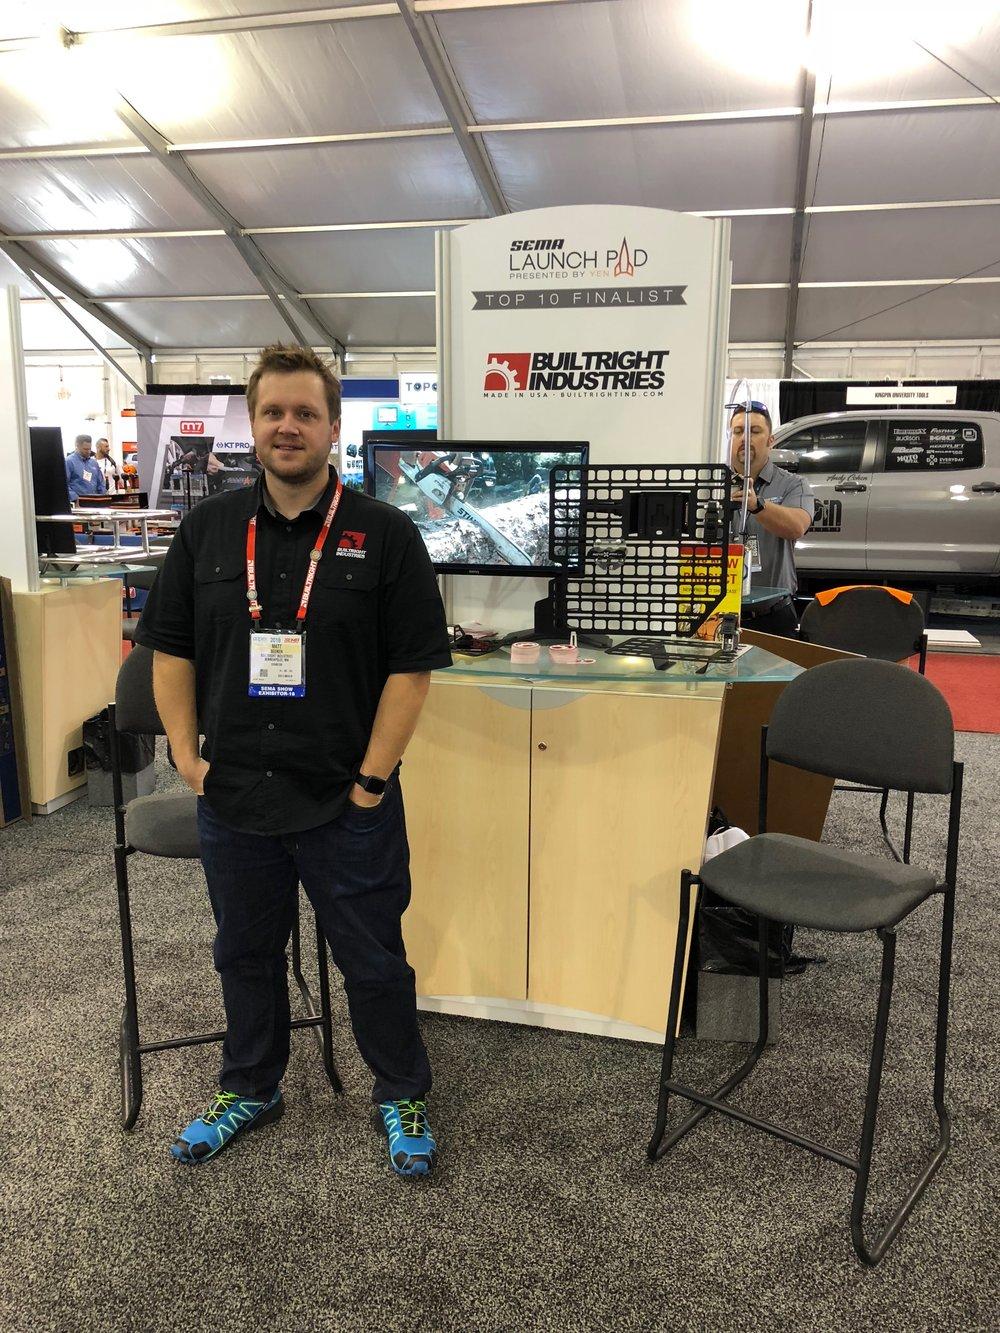 2018 SEMA Launch Pad Winner Matt Beenen